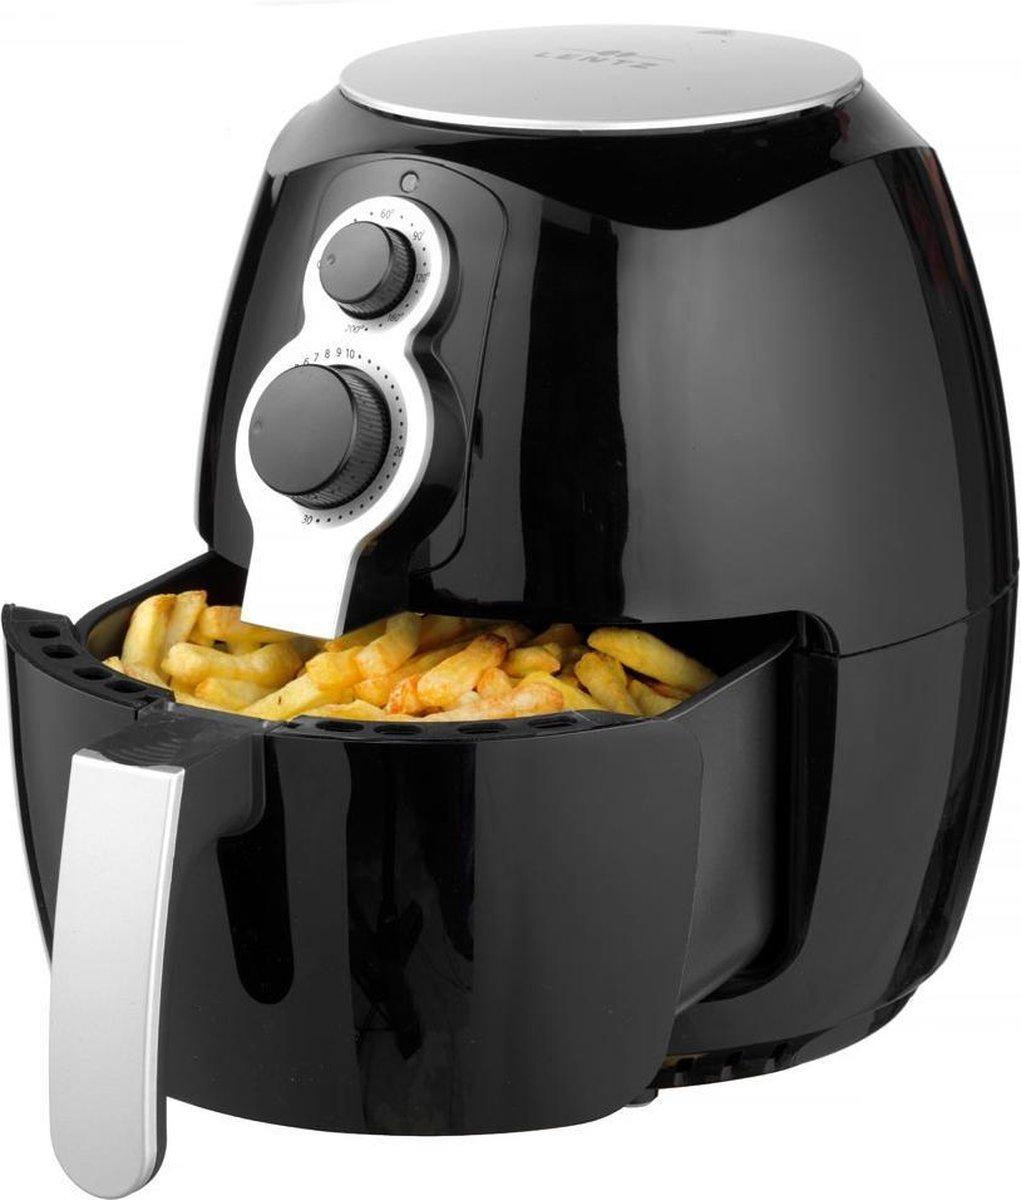 Lentz 29024 - Hetelucht friteuse - 3.6 liter - 1400 Watt - zwart